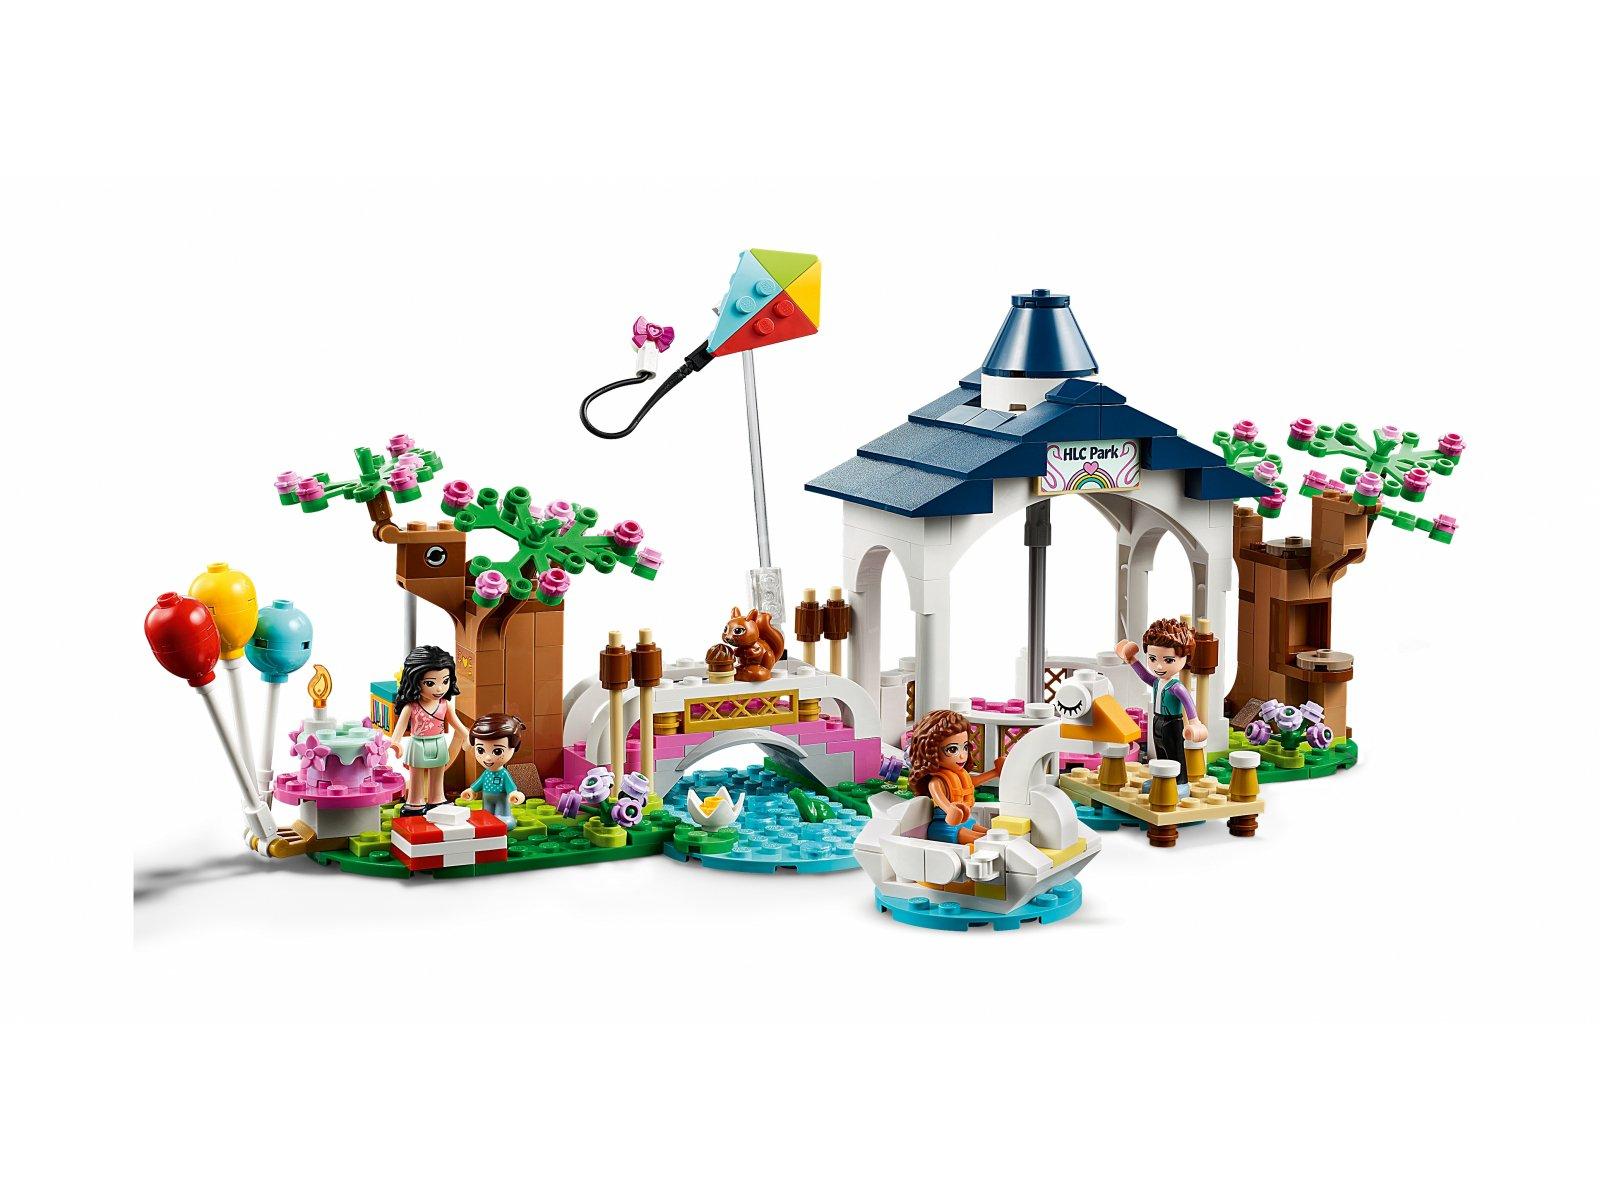 LEGO Friends Park w Heartlake City 41447